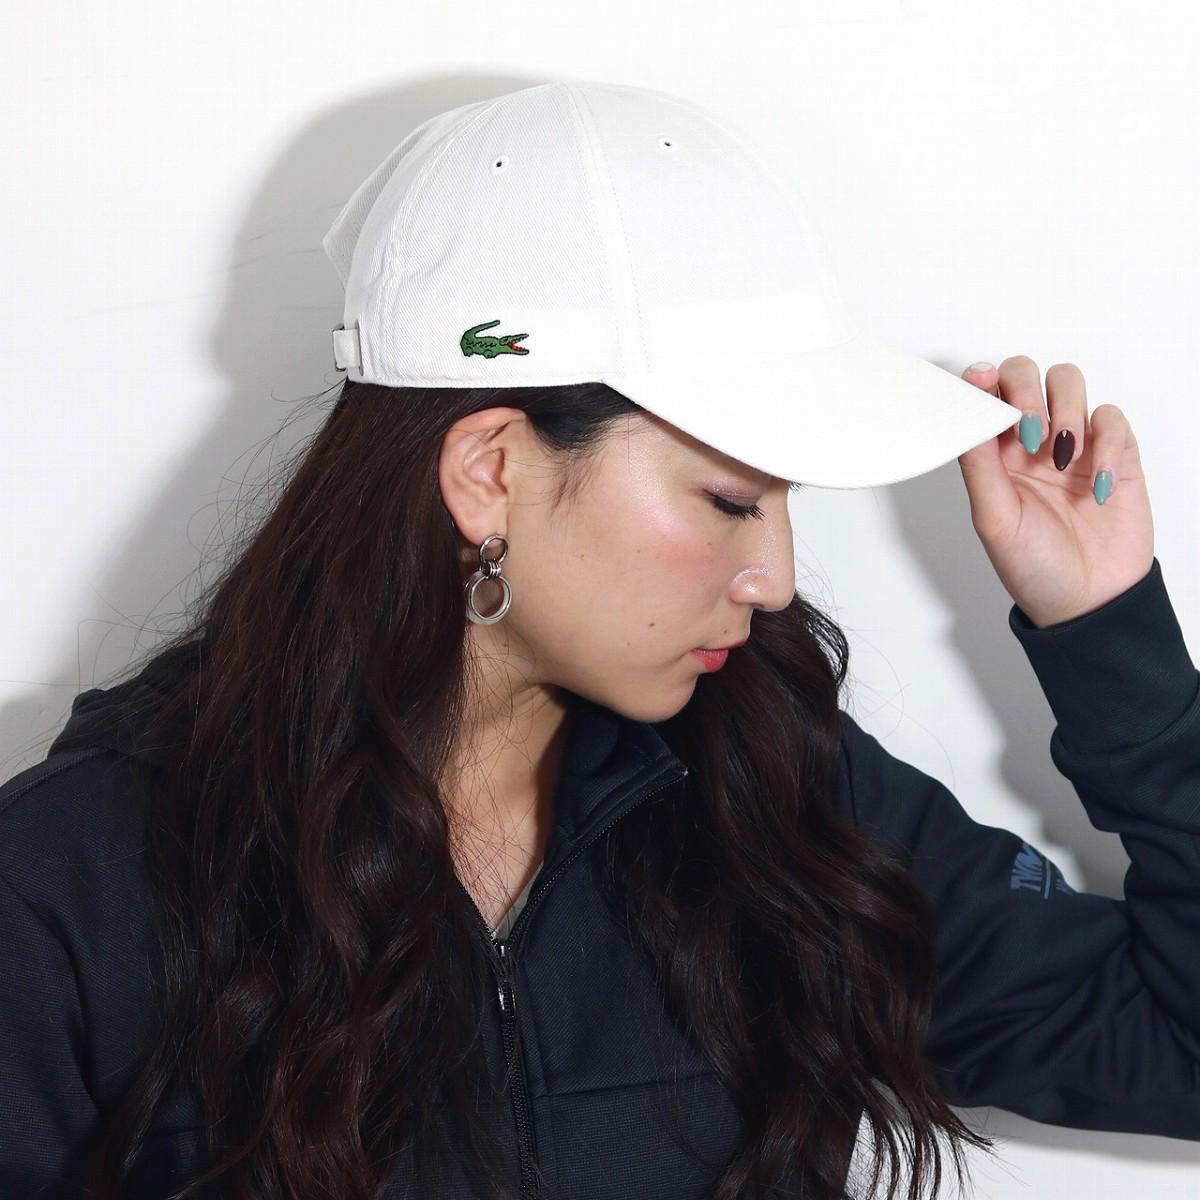 8b4759fa5e8 ELEHELM HAT STORE: The mark white of the cloth for LACOSTE cap cotton  Lacoste hat men gap Dis crocodile is off-white | Rakuten Global Market